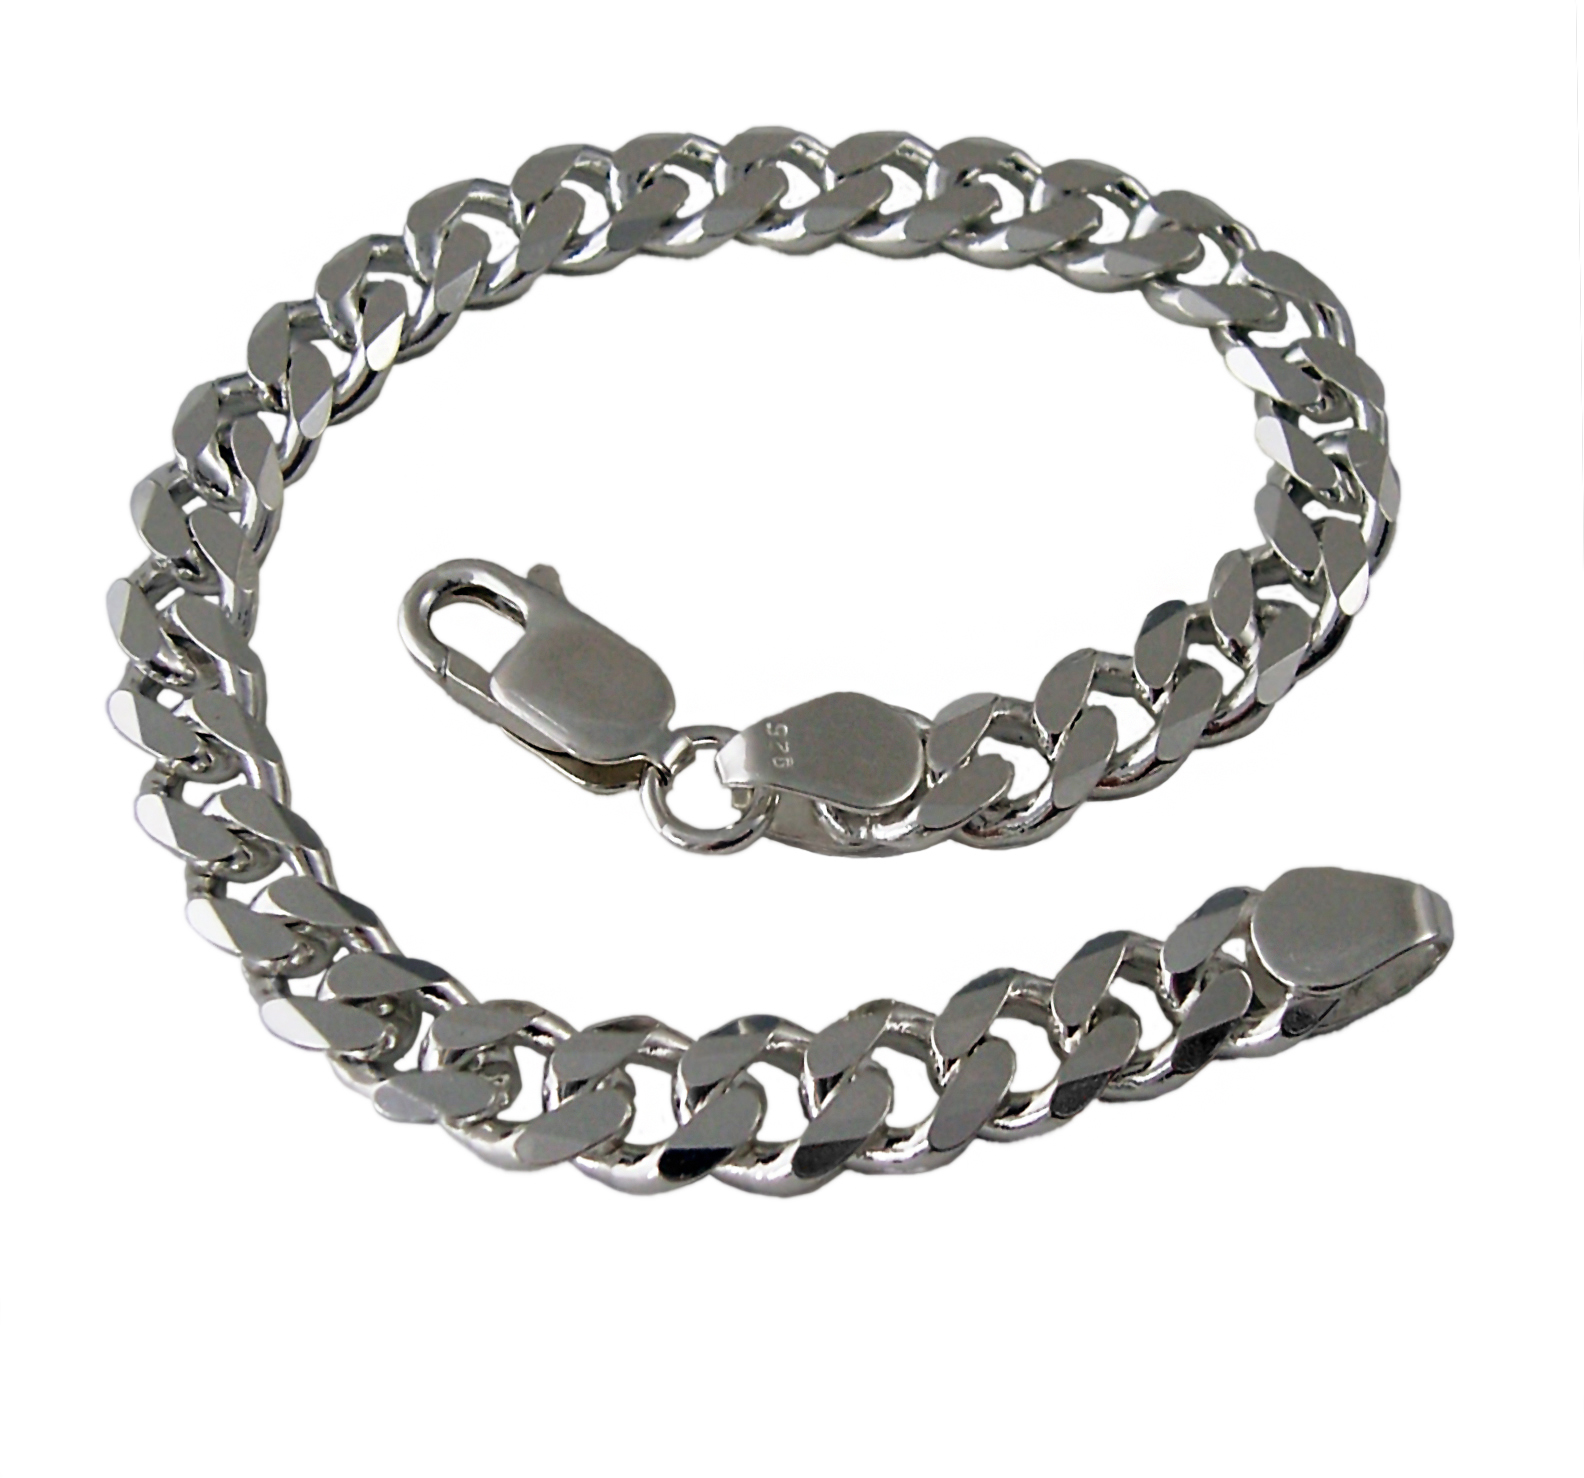 Niklarson Panzerarmband 7,3mmx23cm Sterling Silber 925 Silberarmband 13573-23